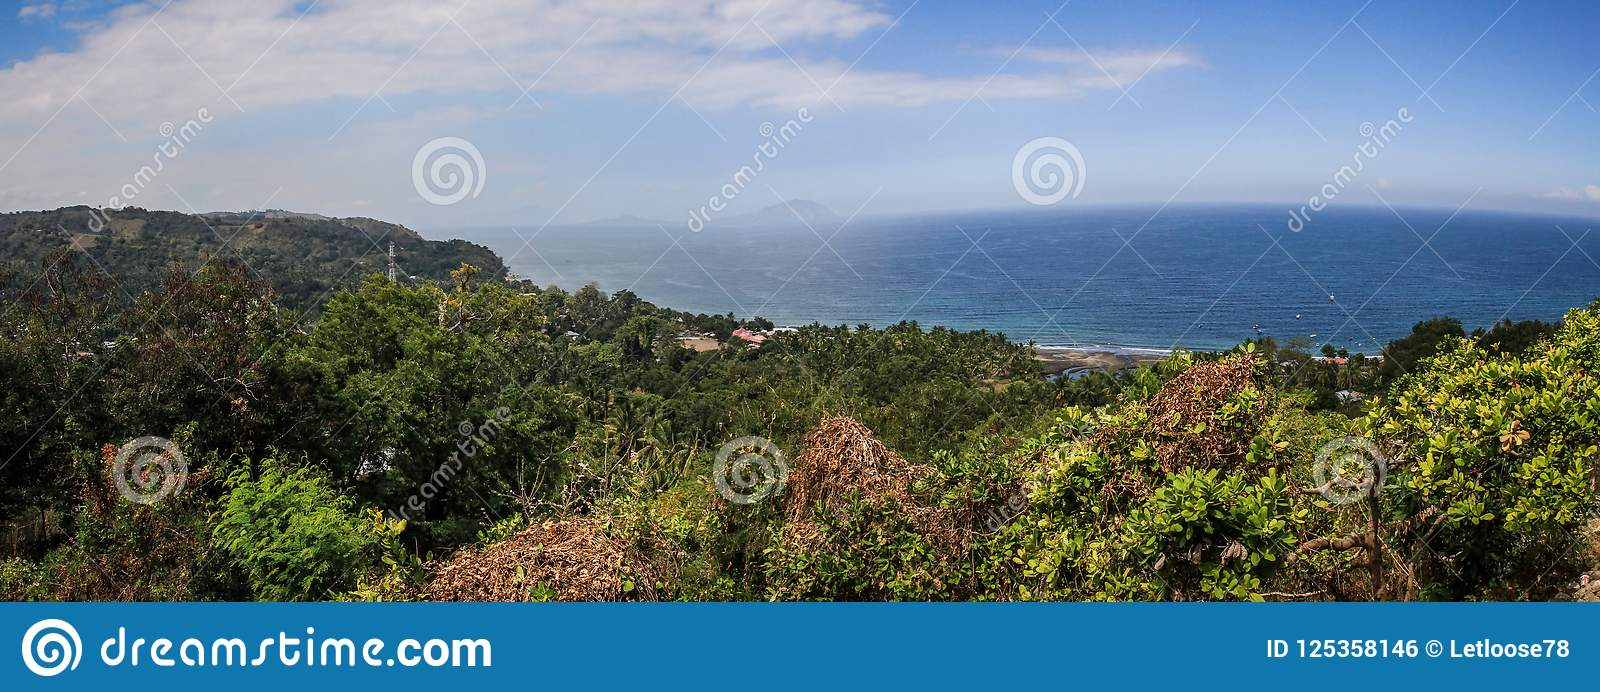 Panorama sulla bella baia vicino al moni, Nusa Tenggara, isola di Flores, Indonesia